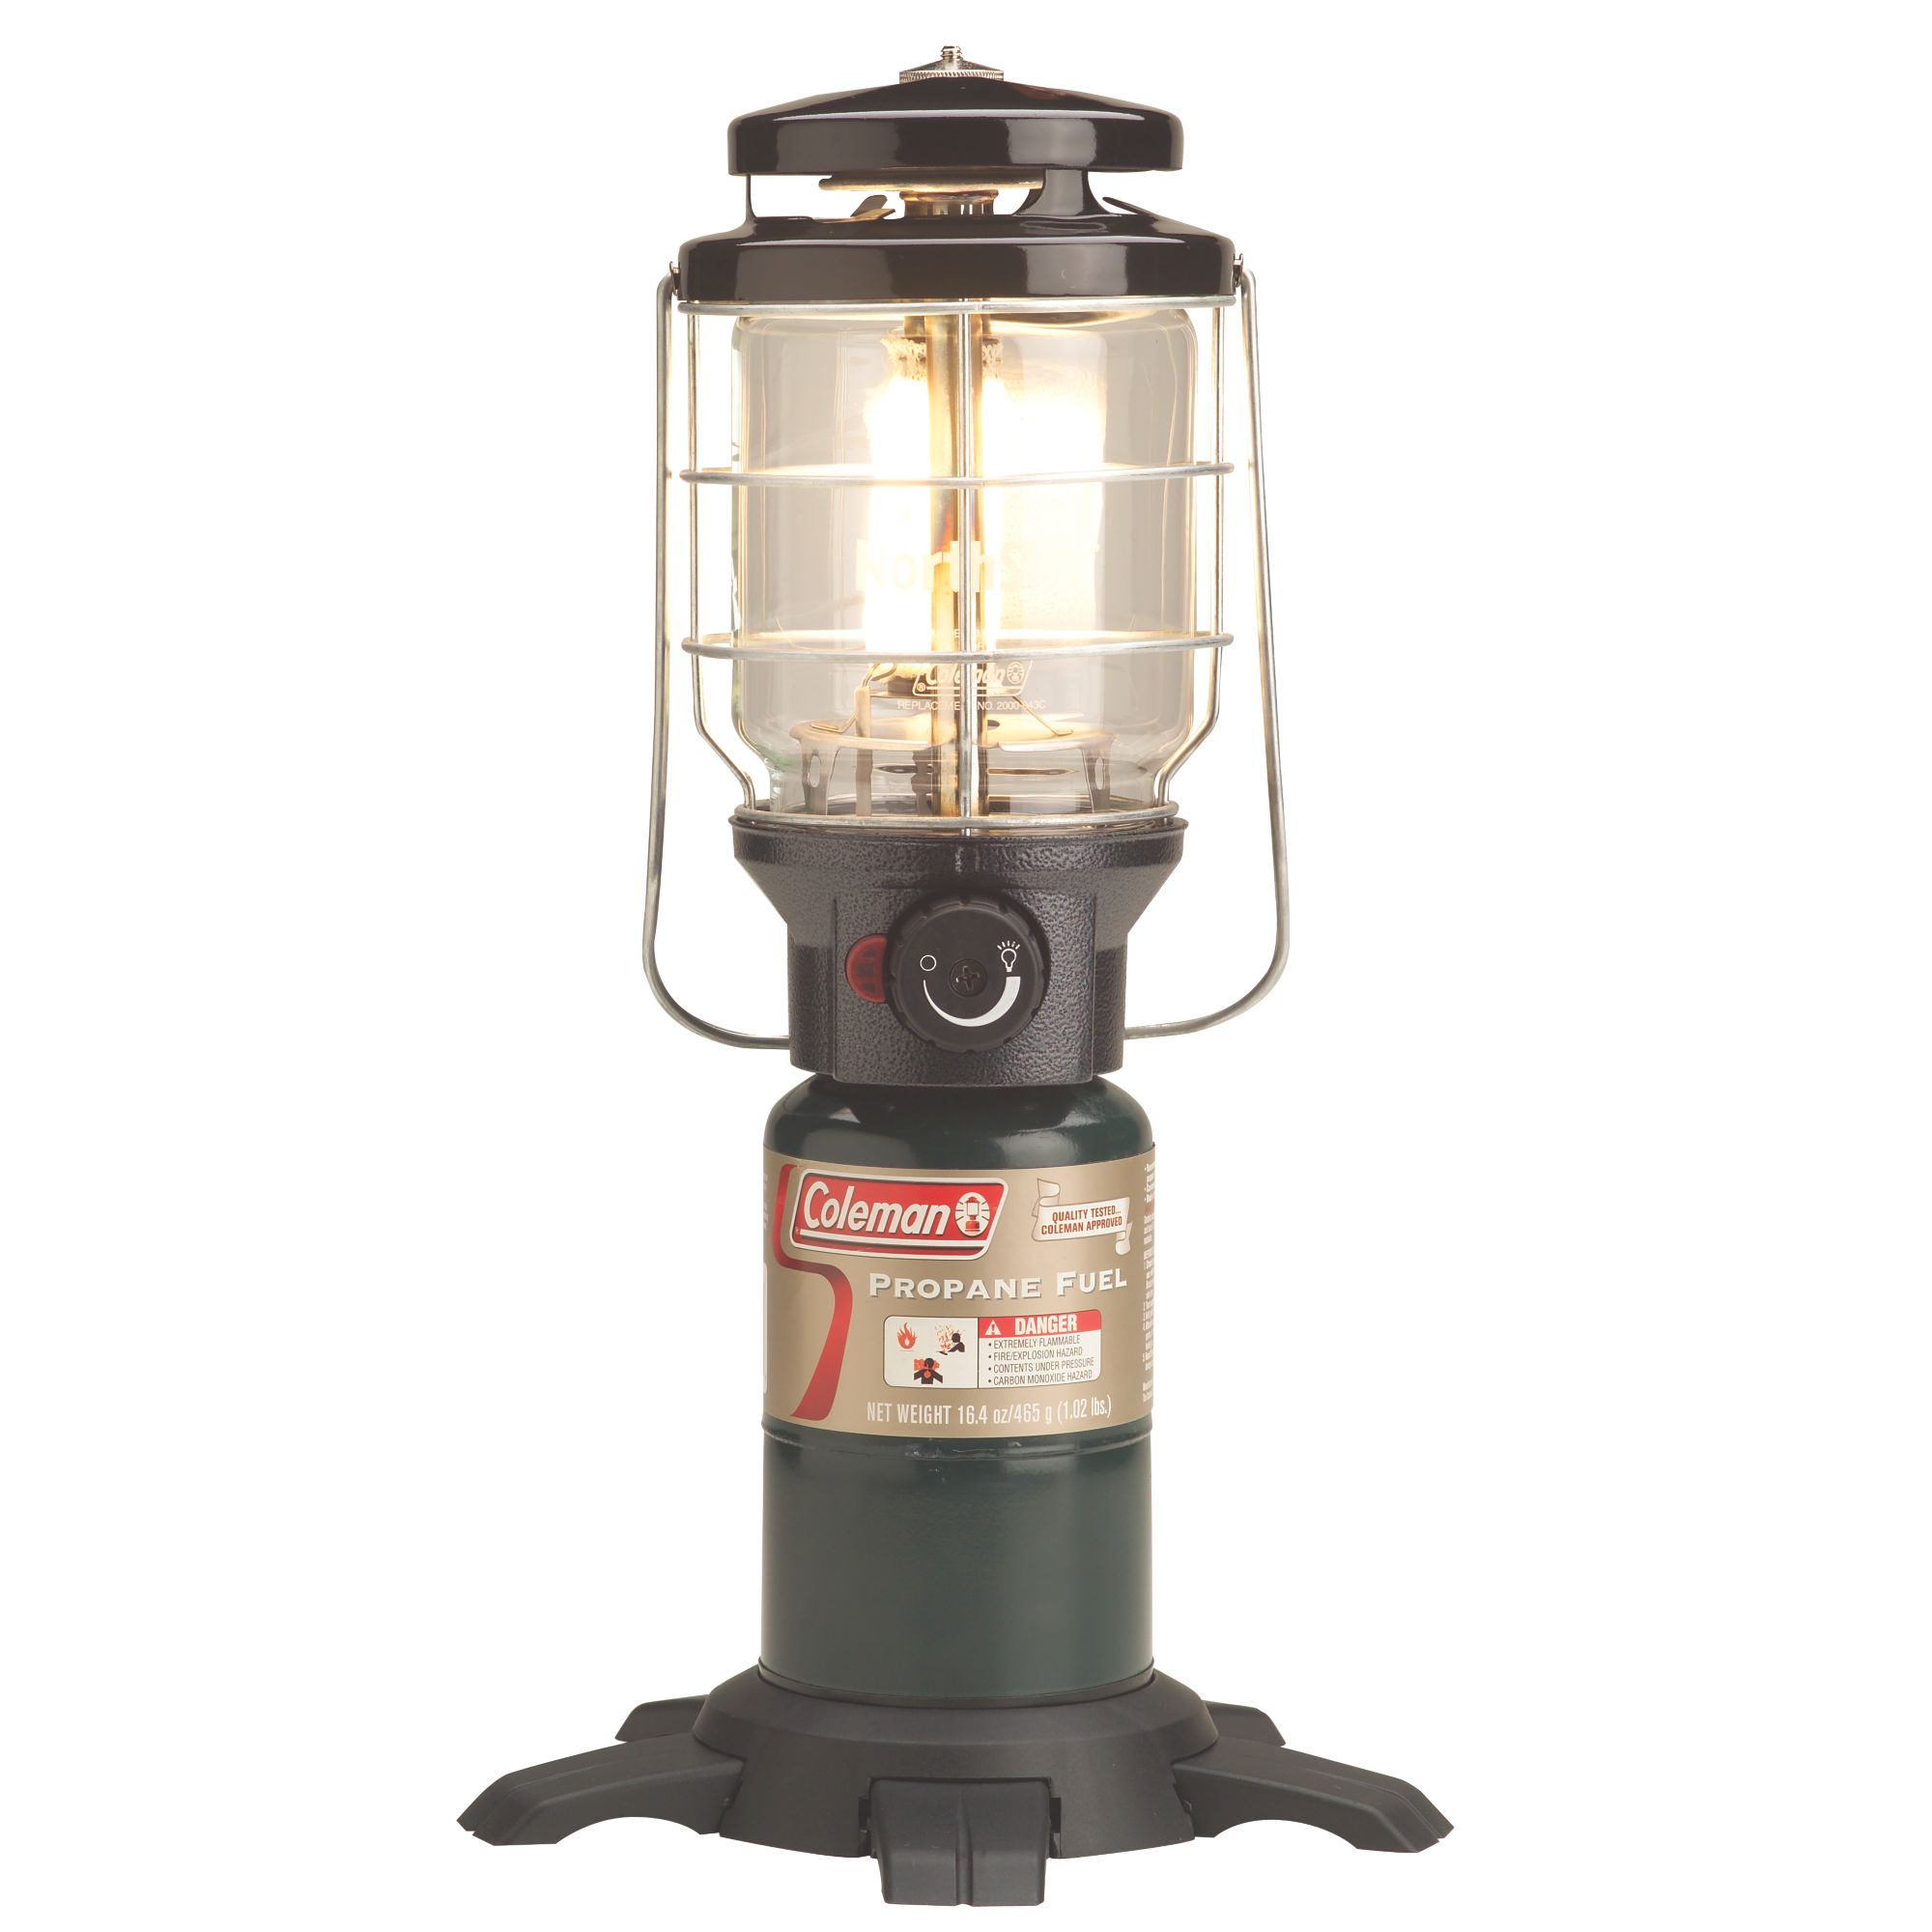 Northstar Propane Lantern